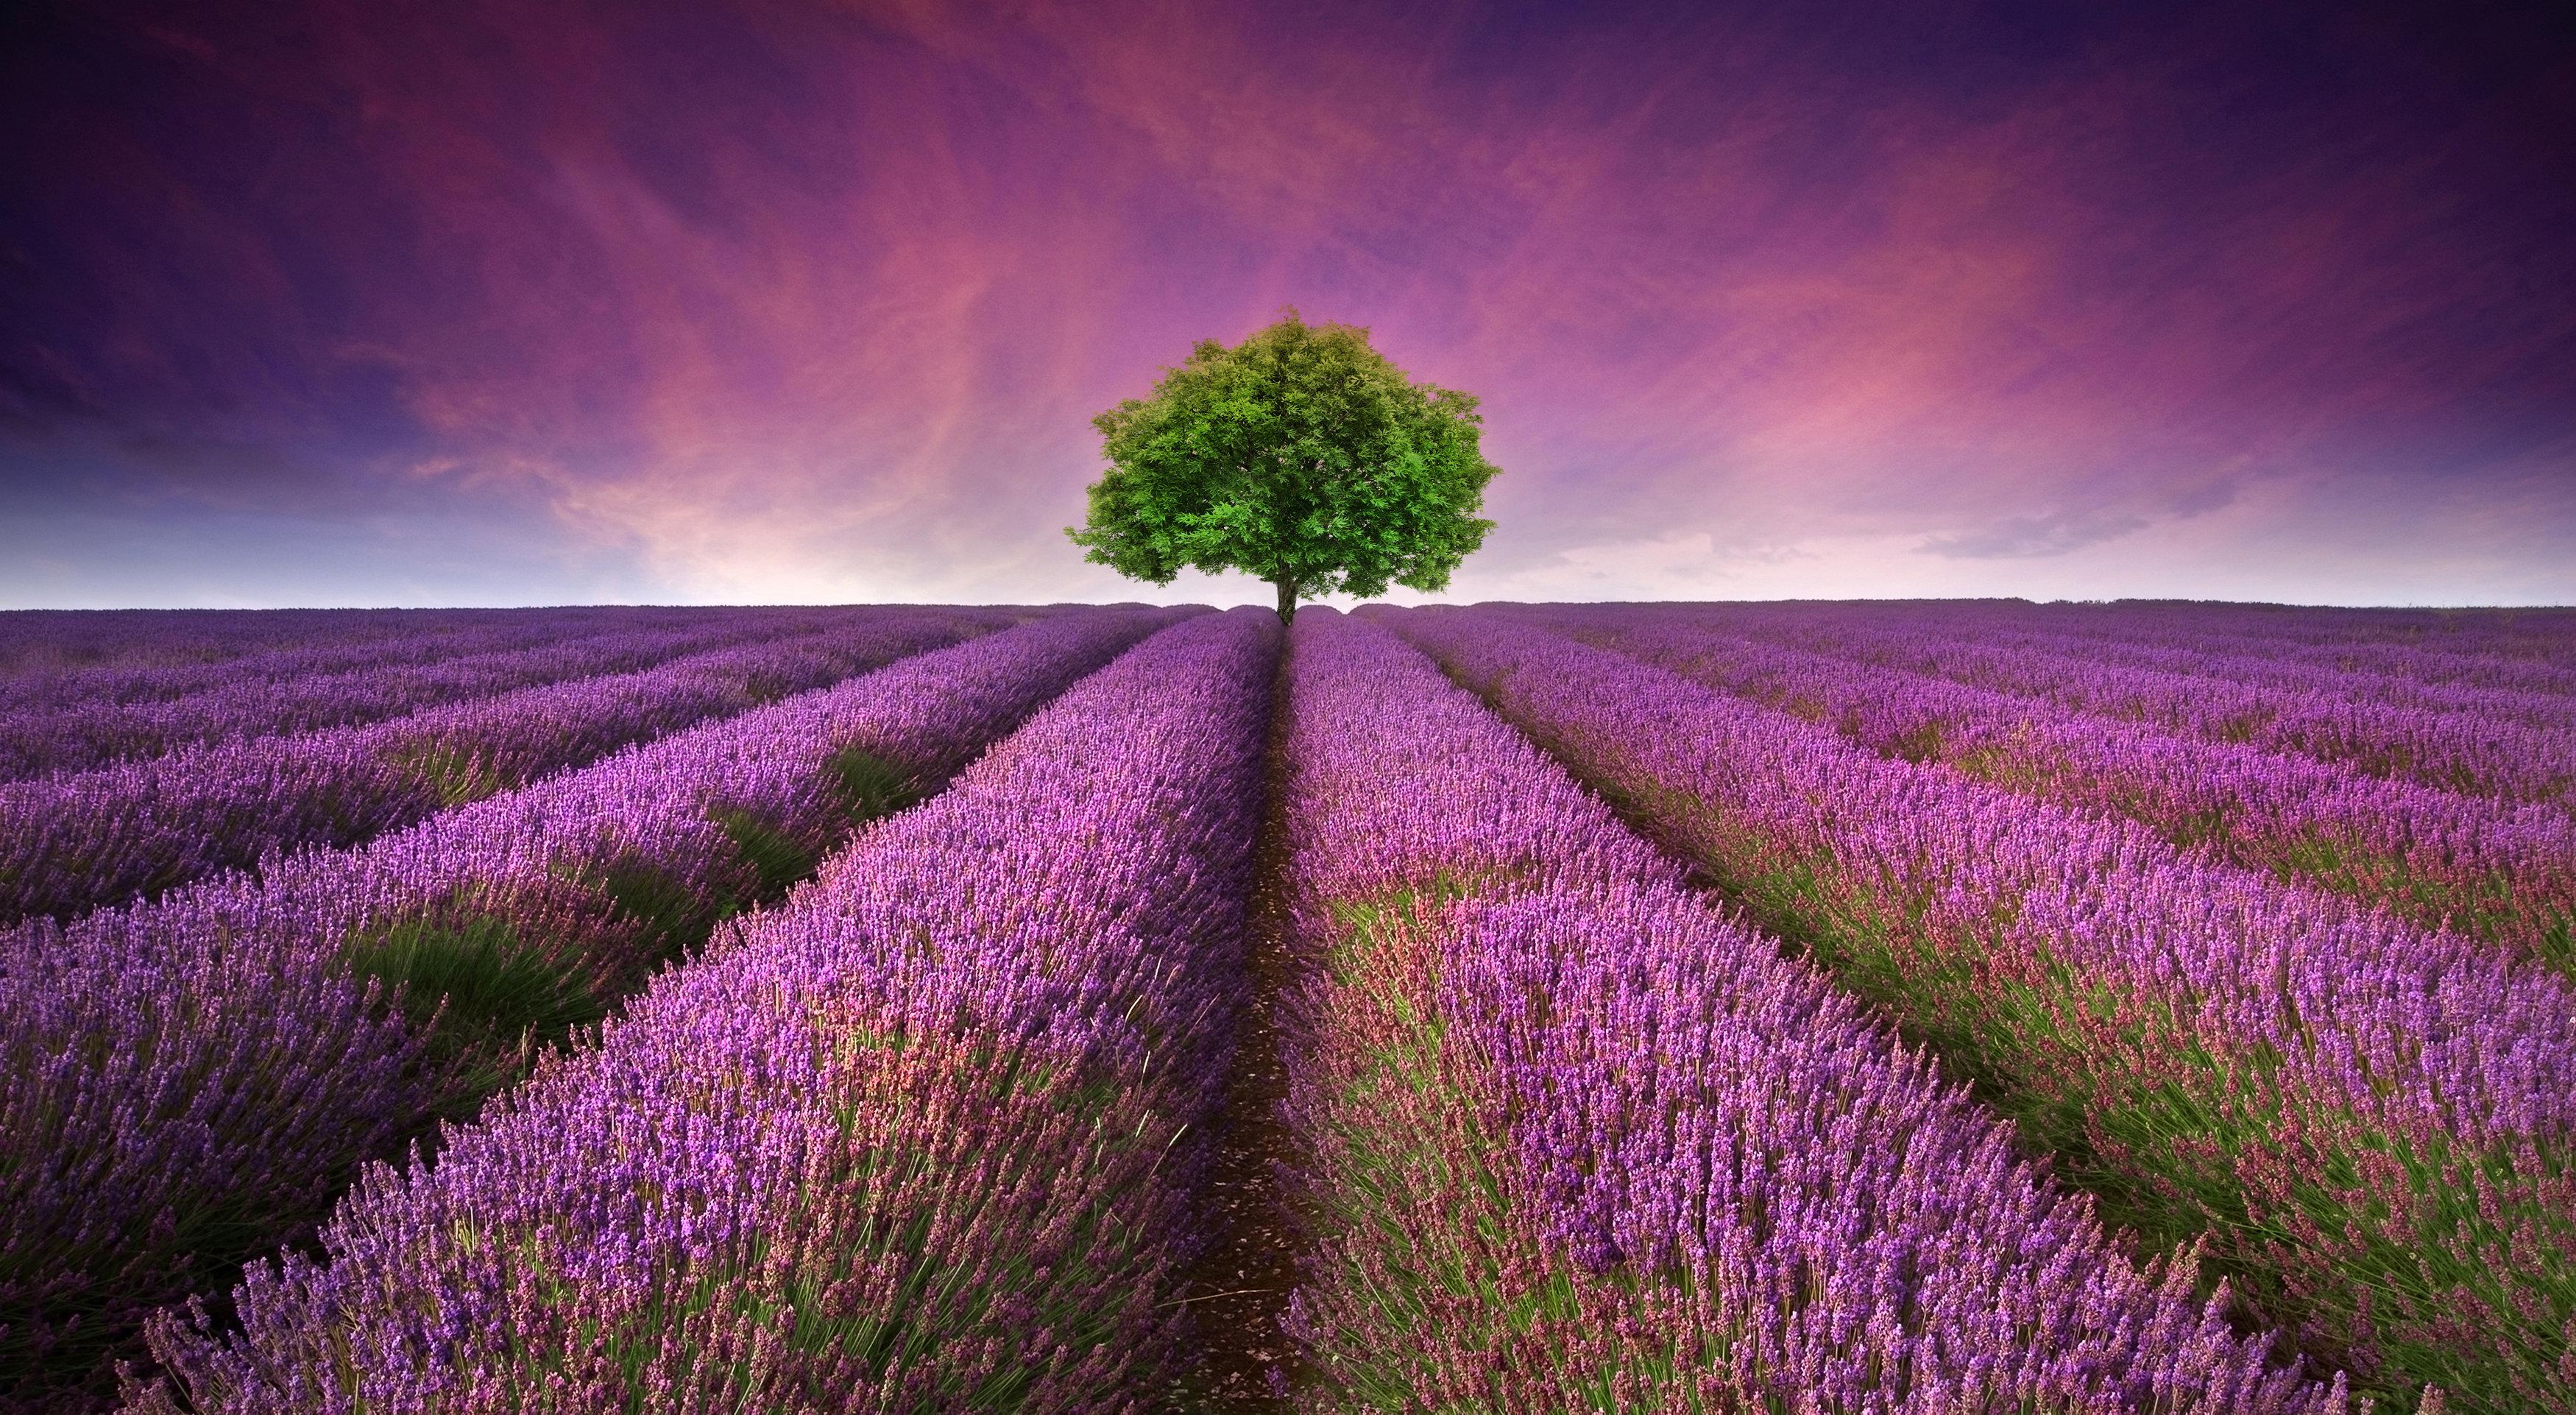 Lavender (Lavandula angustifolia) Essential Oil - 15ml EO-LAV15